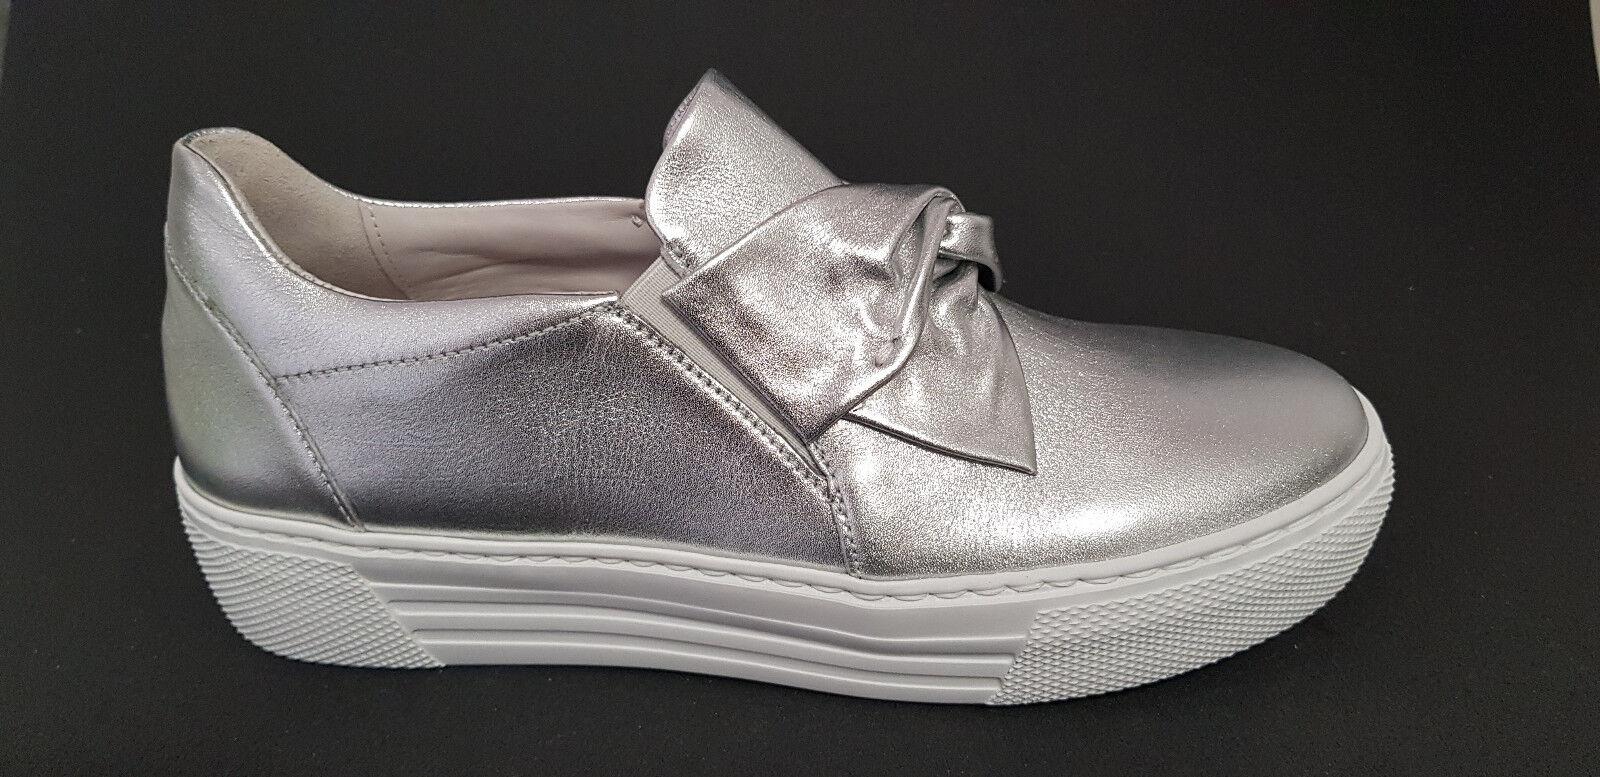 Gabor Comfort Damen Sneaker Slipper Schuhe 86.463.10 86.463.10 86.463.10 silber lamina NEU cca84c